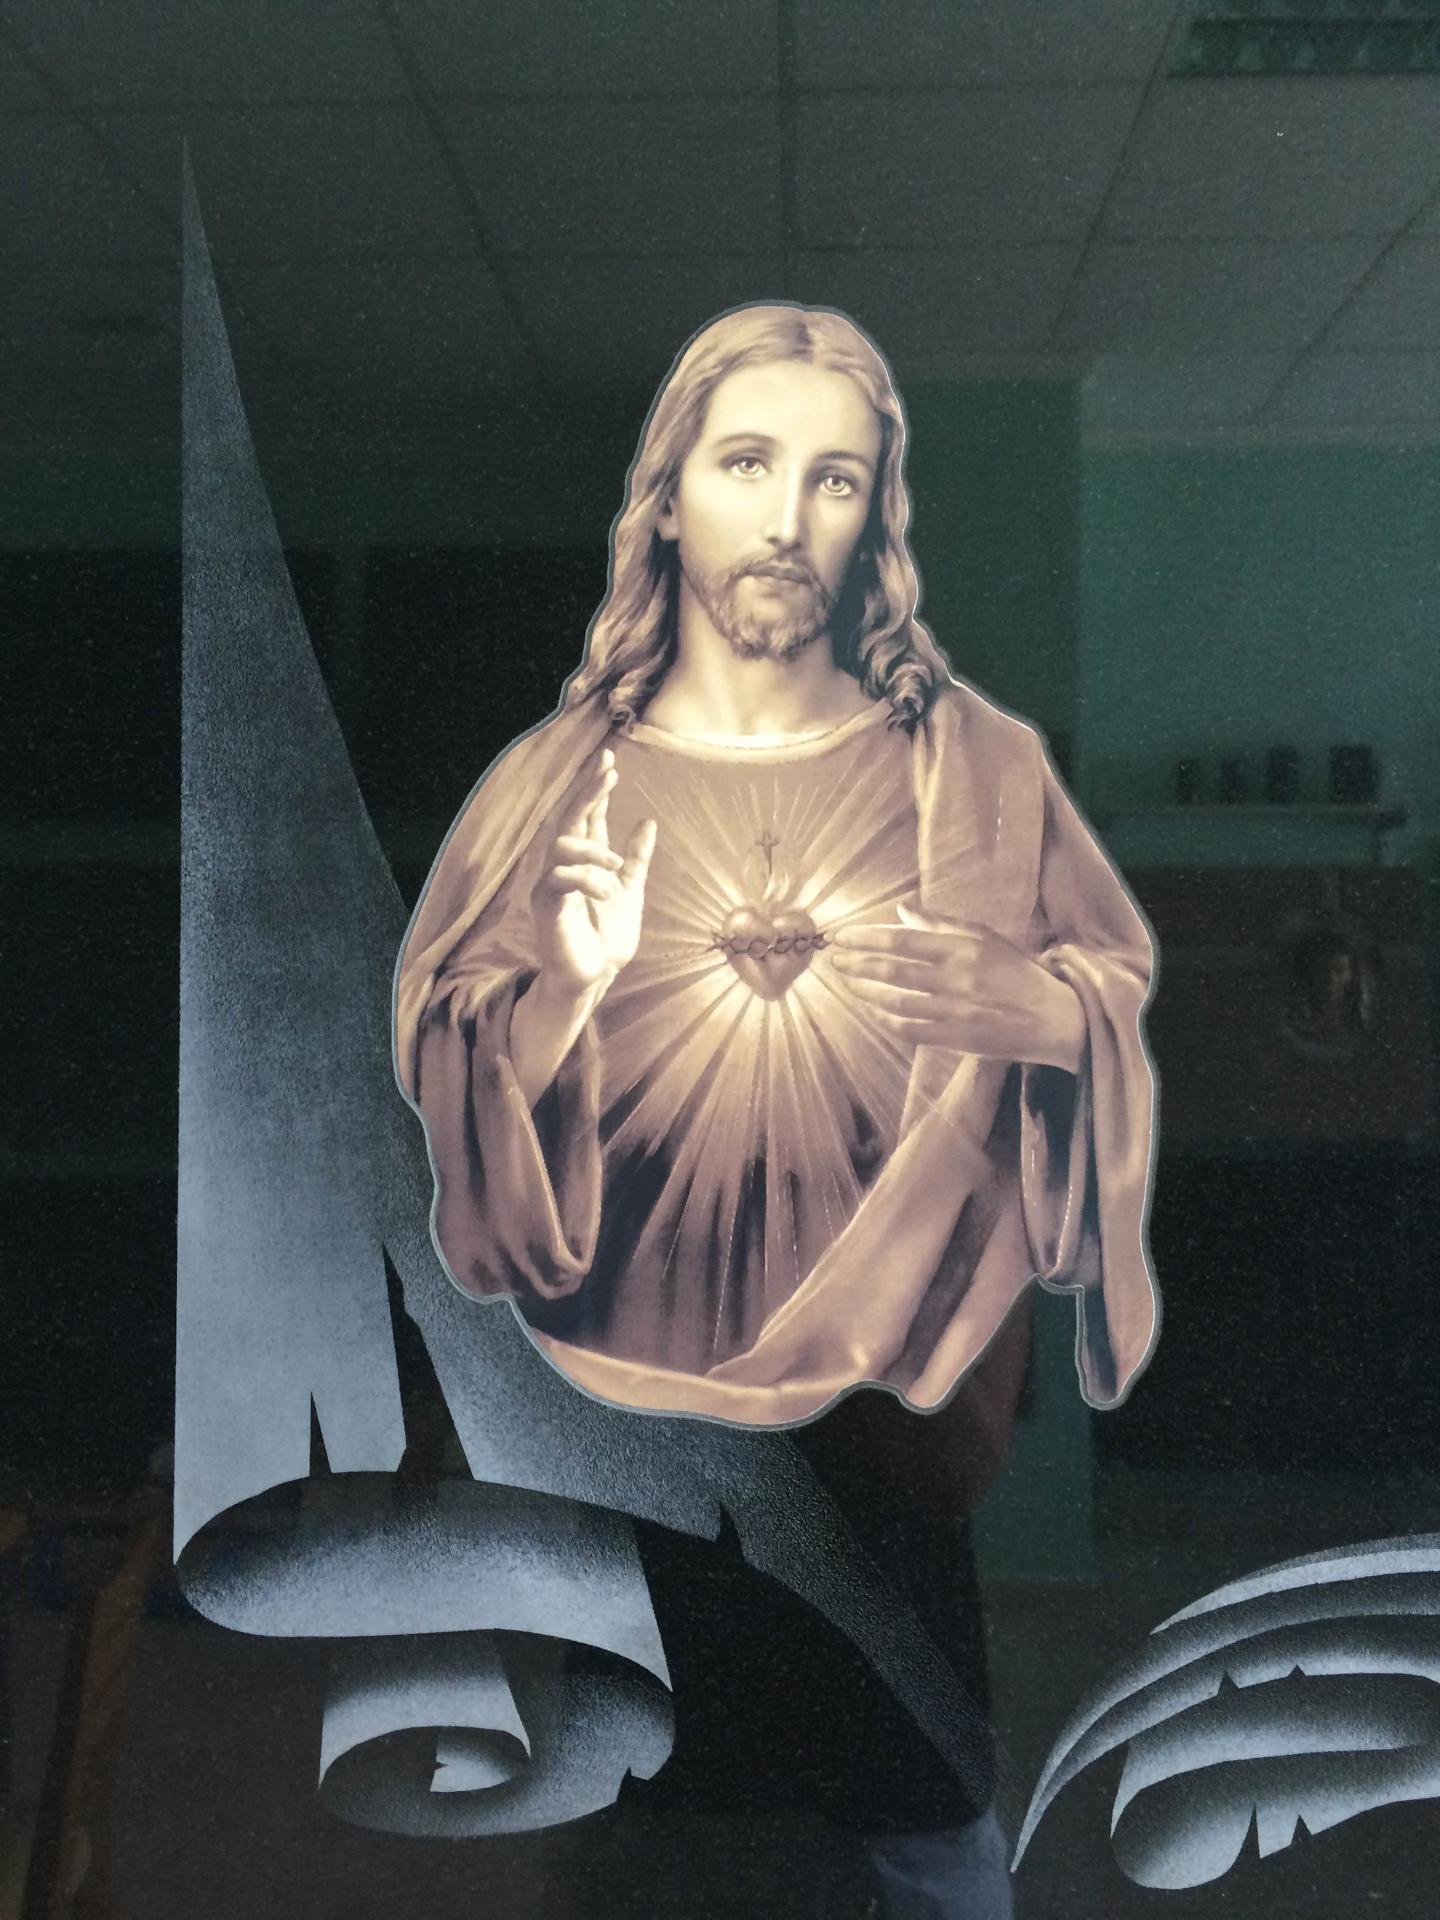 Lapida incrustacion Corazon de Jesus